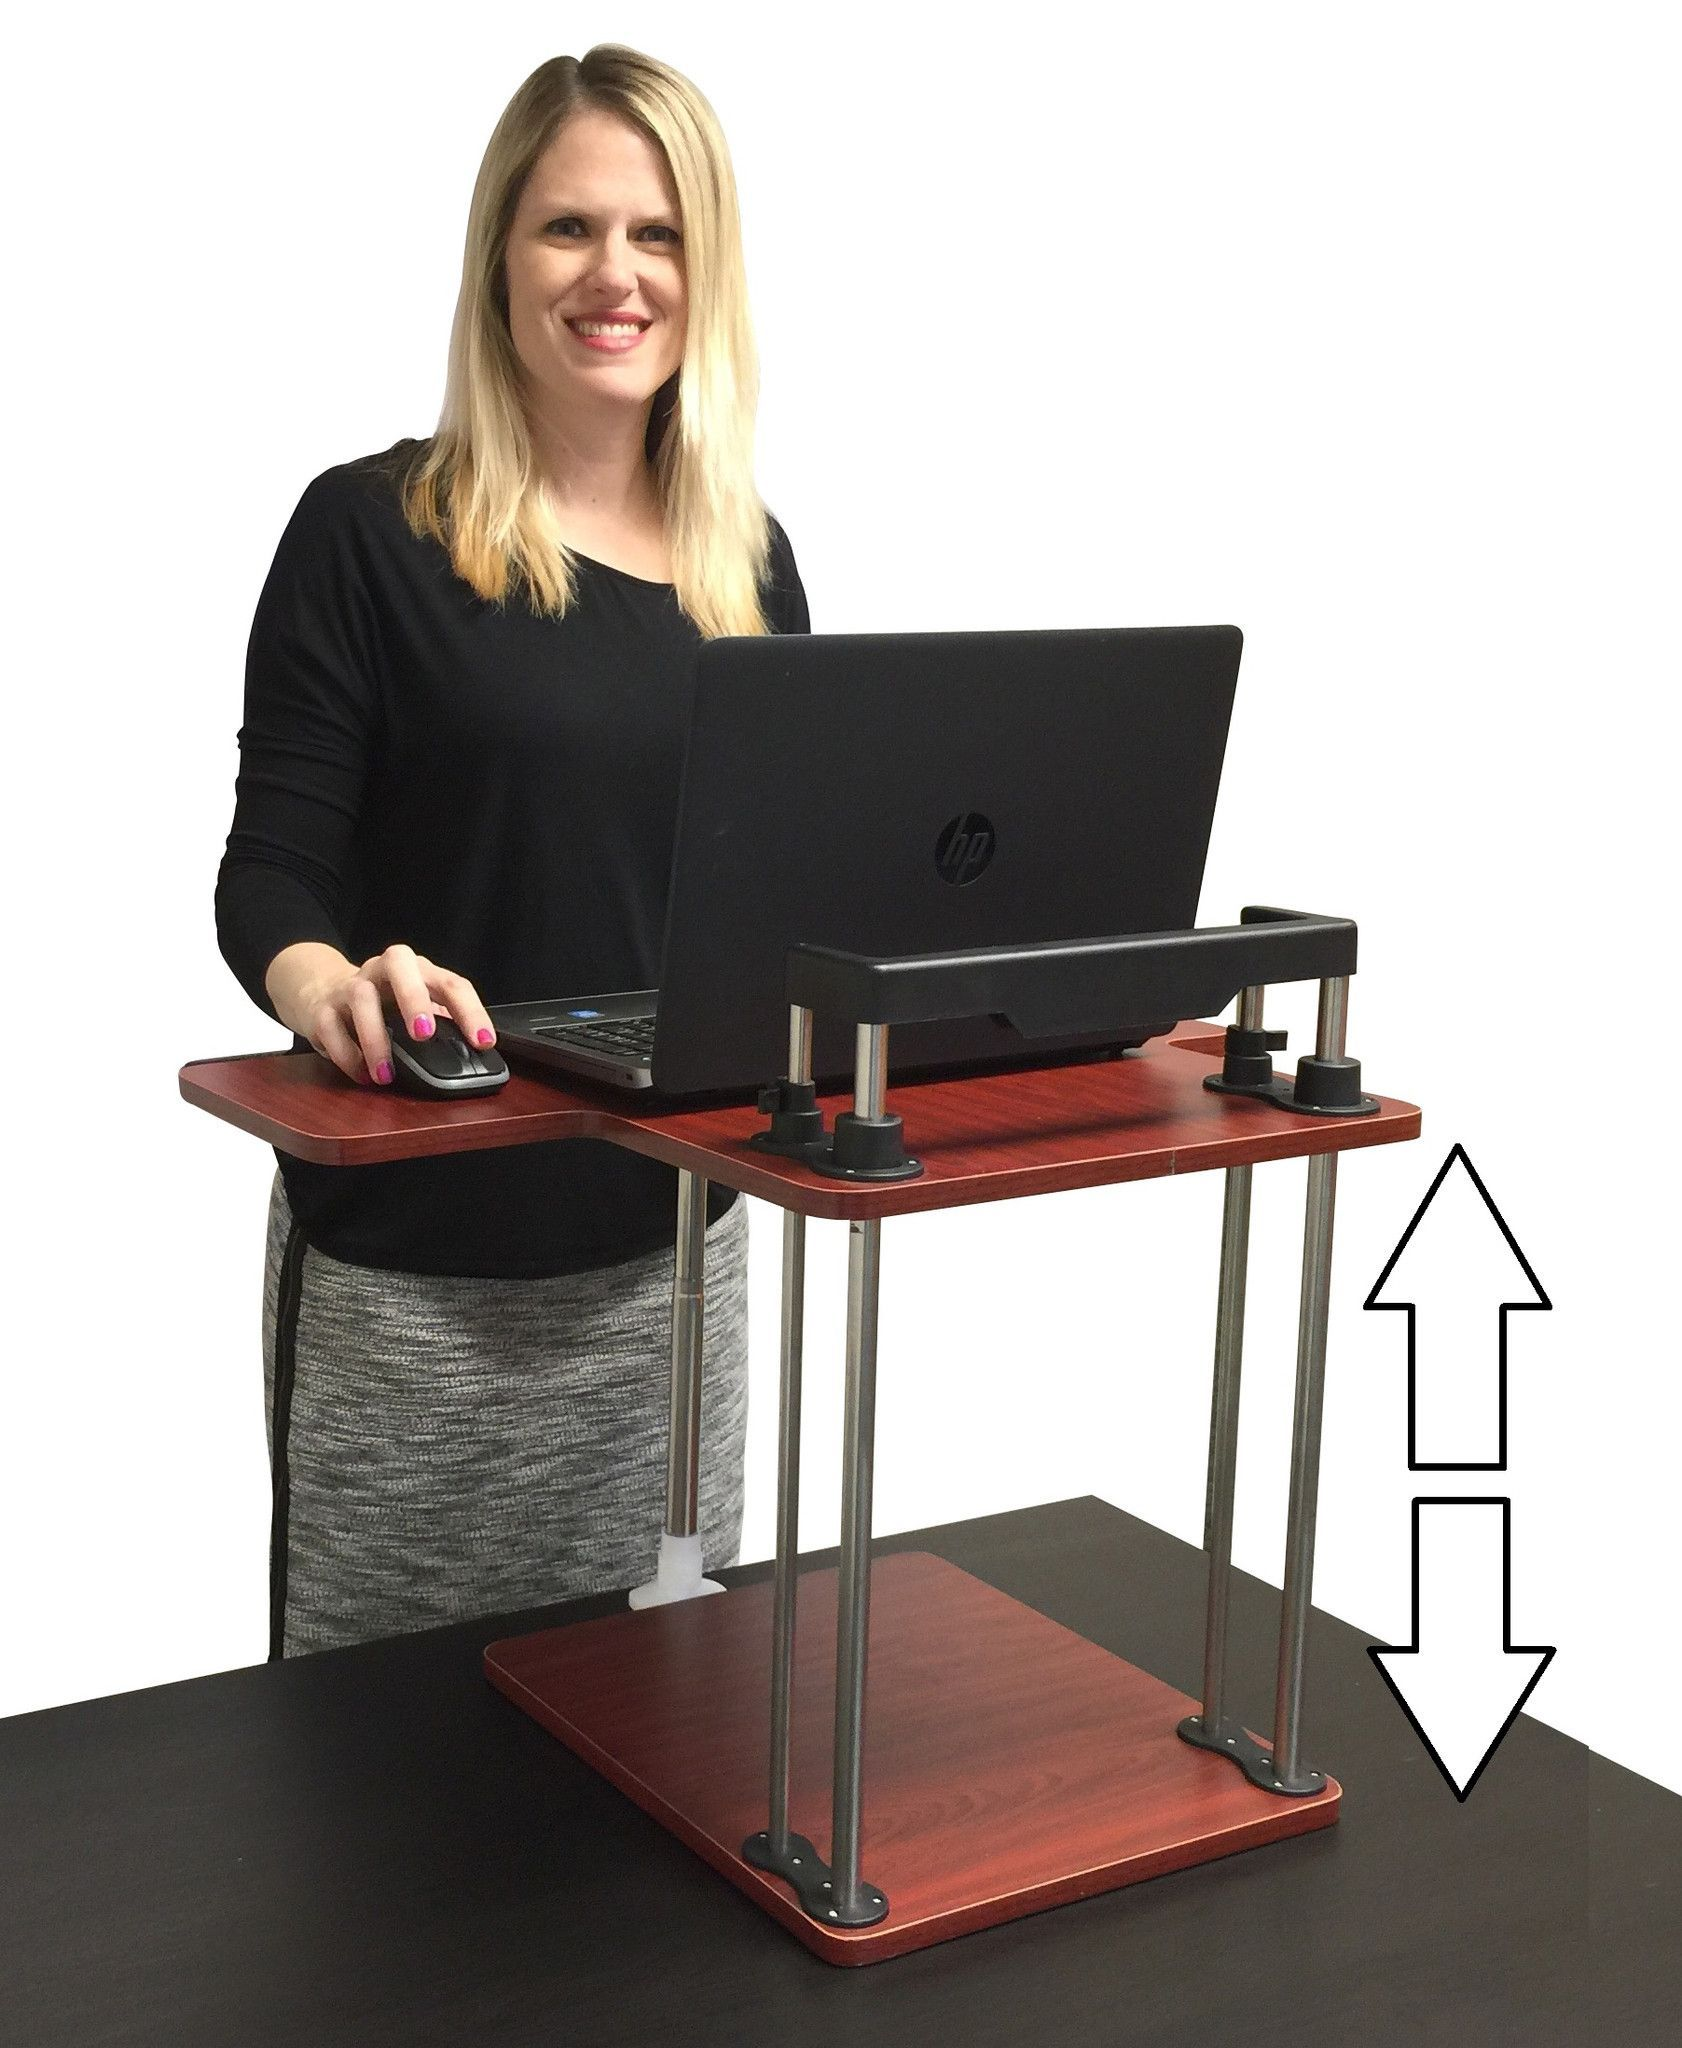 The Uptrak Standing Desk Converts Any Sized Desk Into A Sit Stand Desk Sit Stand Desk Standing Desk Diy Standing Desk